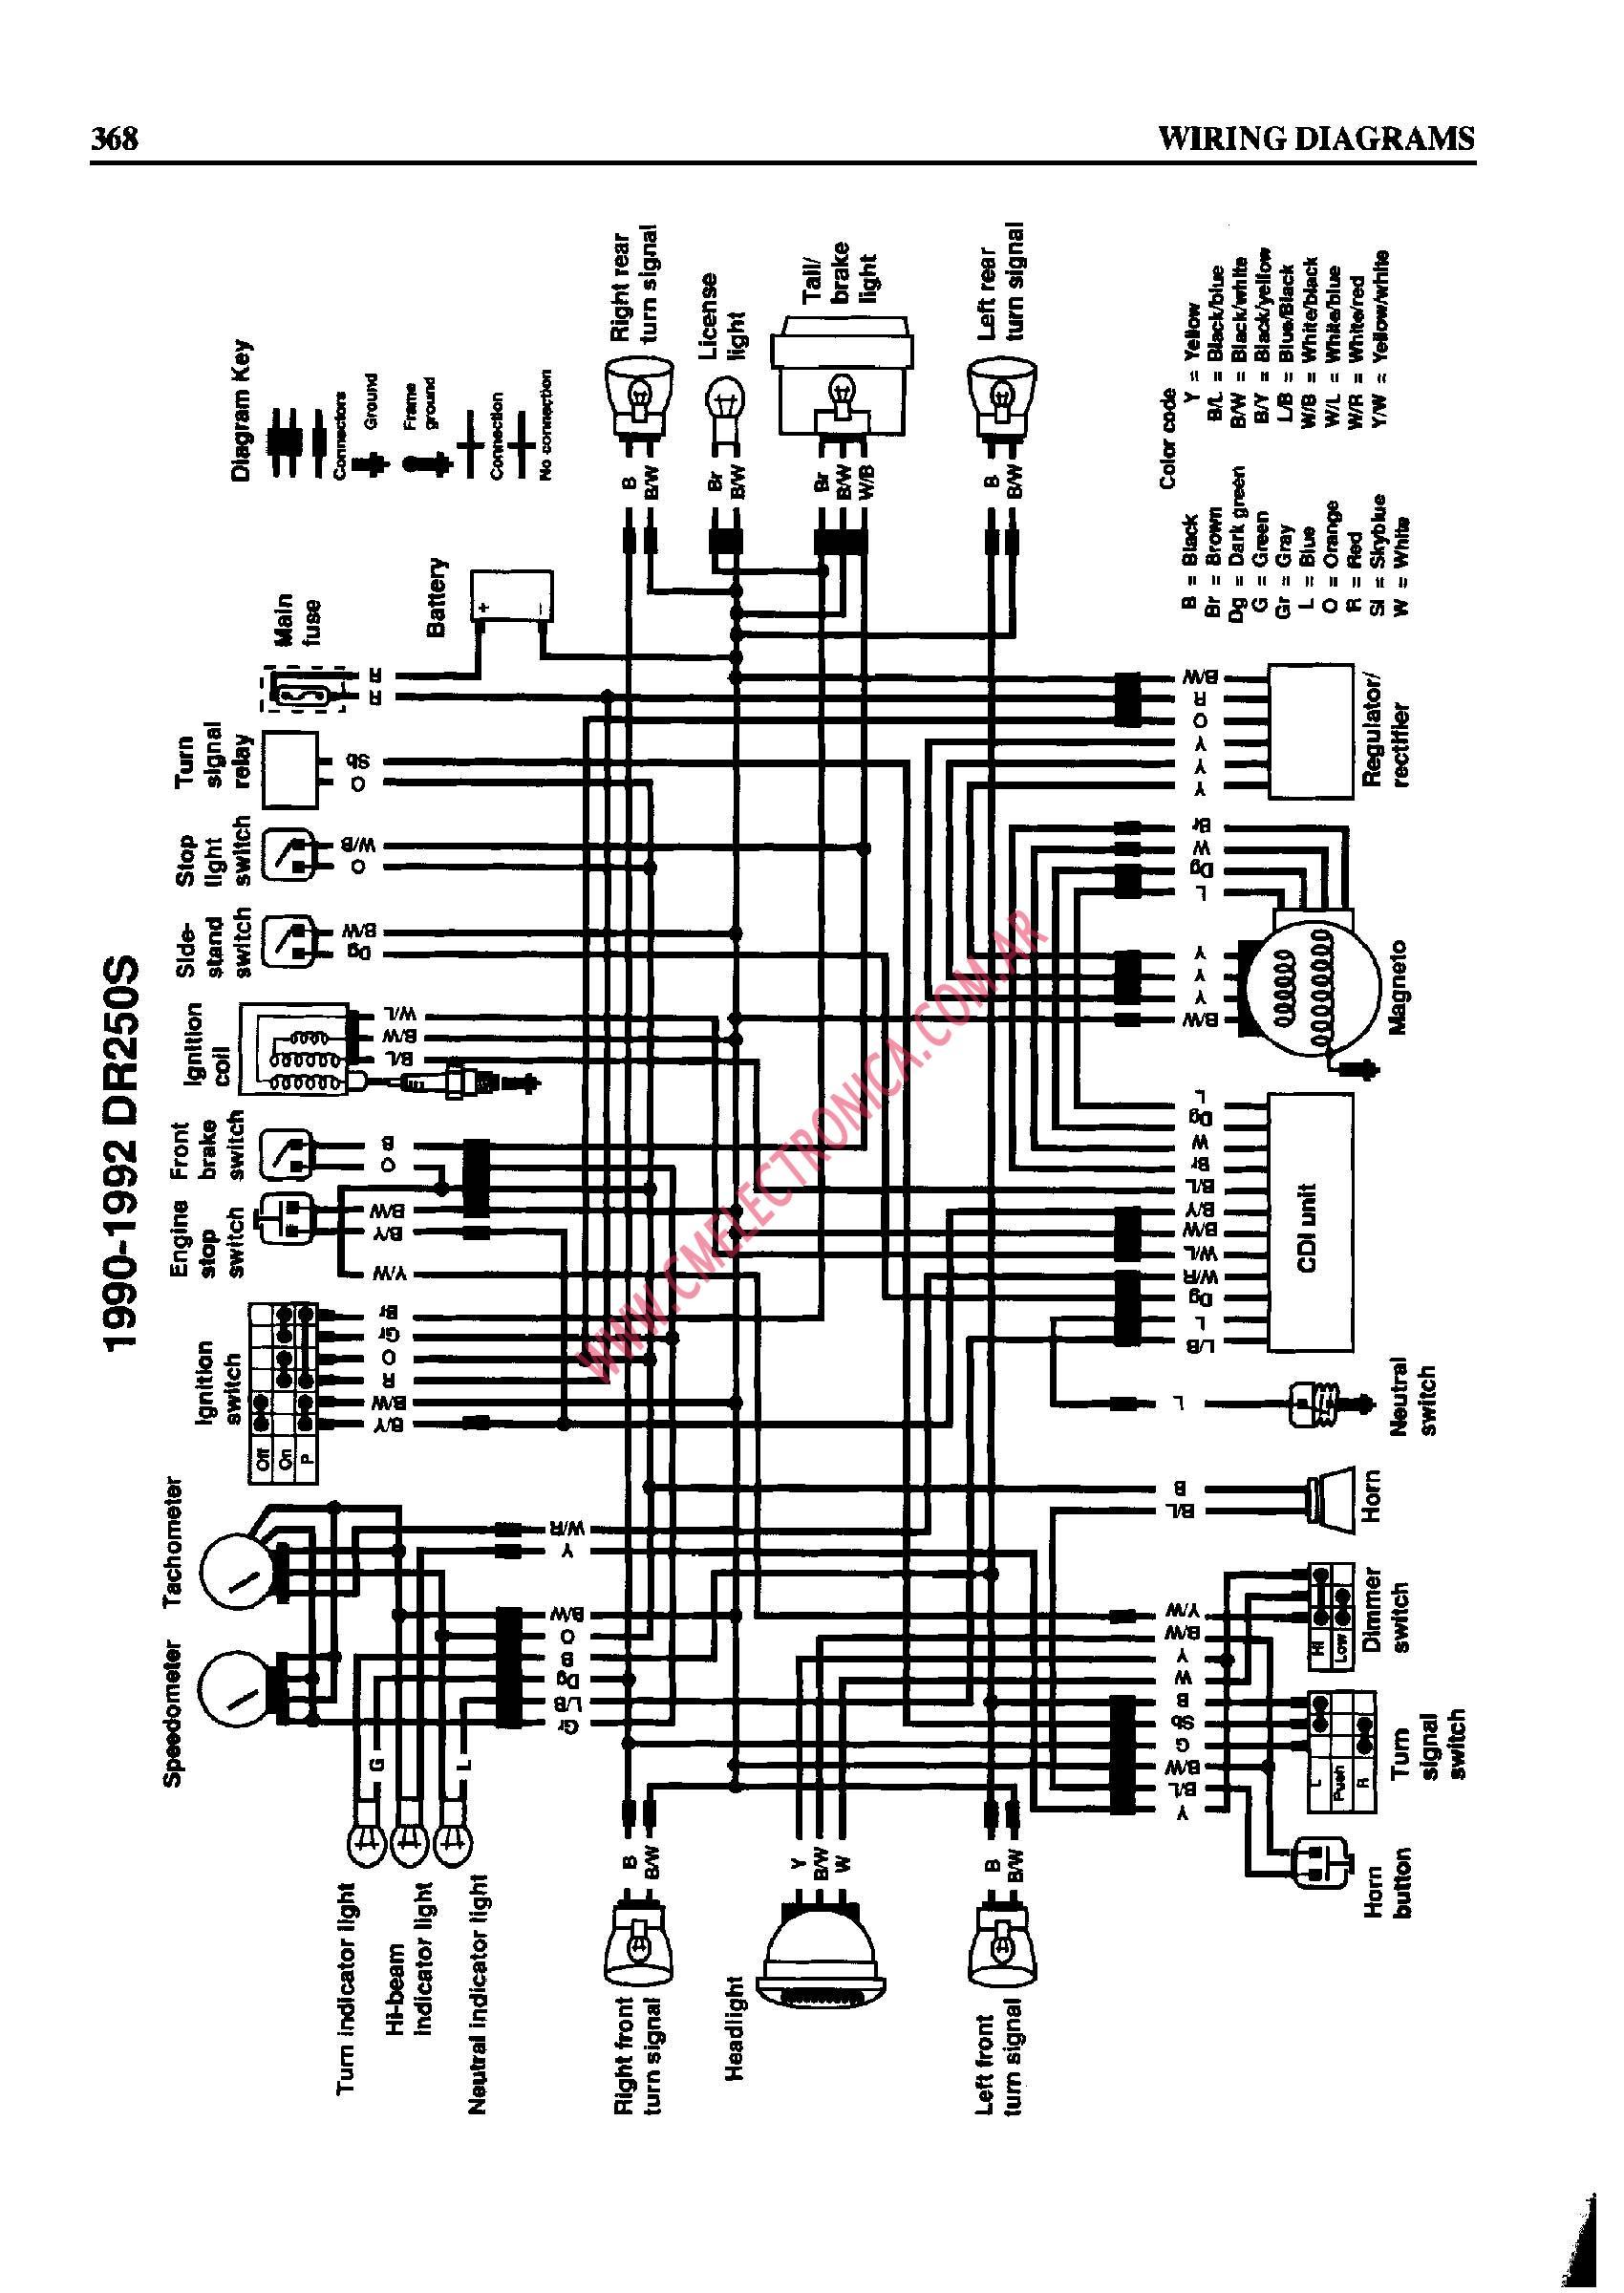 Tl1000r race bike wiring diagrams open source diagram software Motorcycle Wiring Diagram Raptor 350 Wiring Diagram 1990 dr350 wiring diagram on dr350 wiring diagram